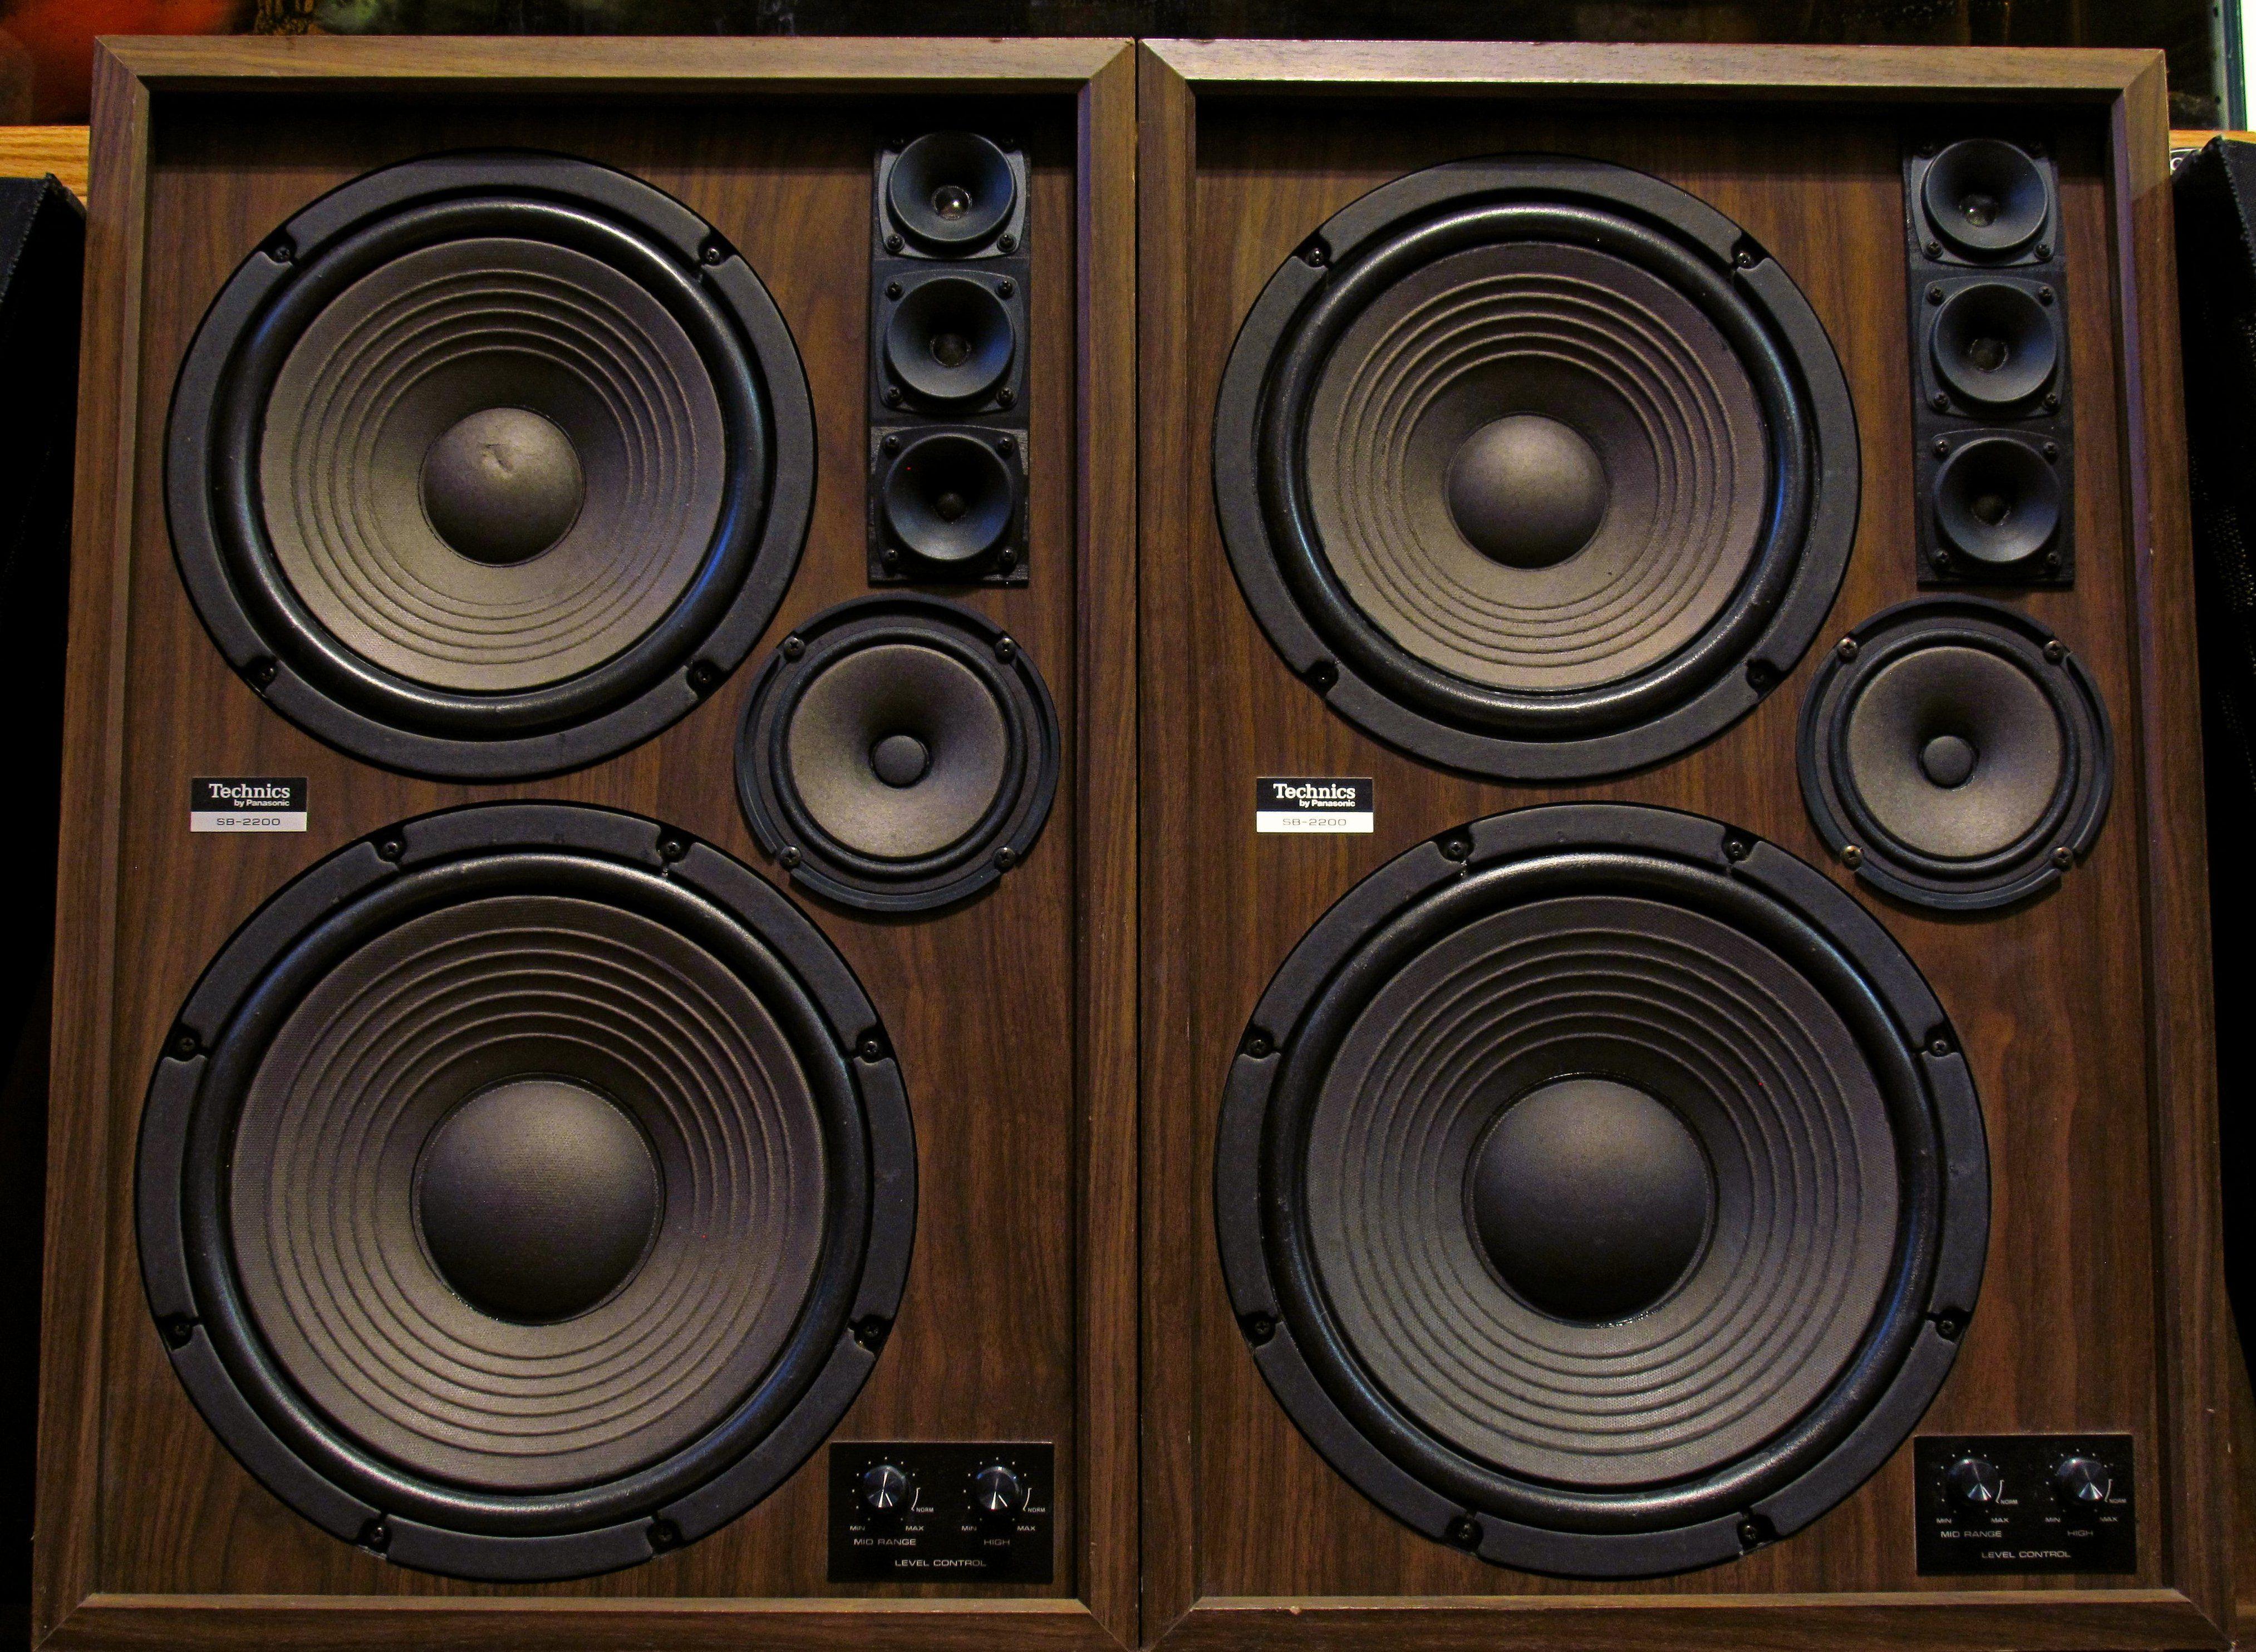 Technics By Panasonic Sb 2200 Speakers Vintage Speakers Hifi Audio Home Theater Sound System